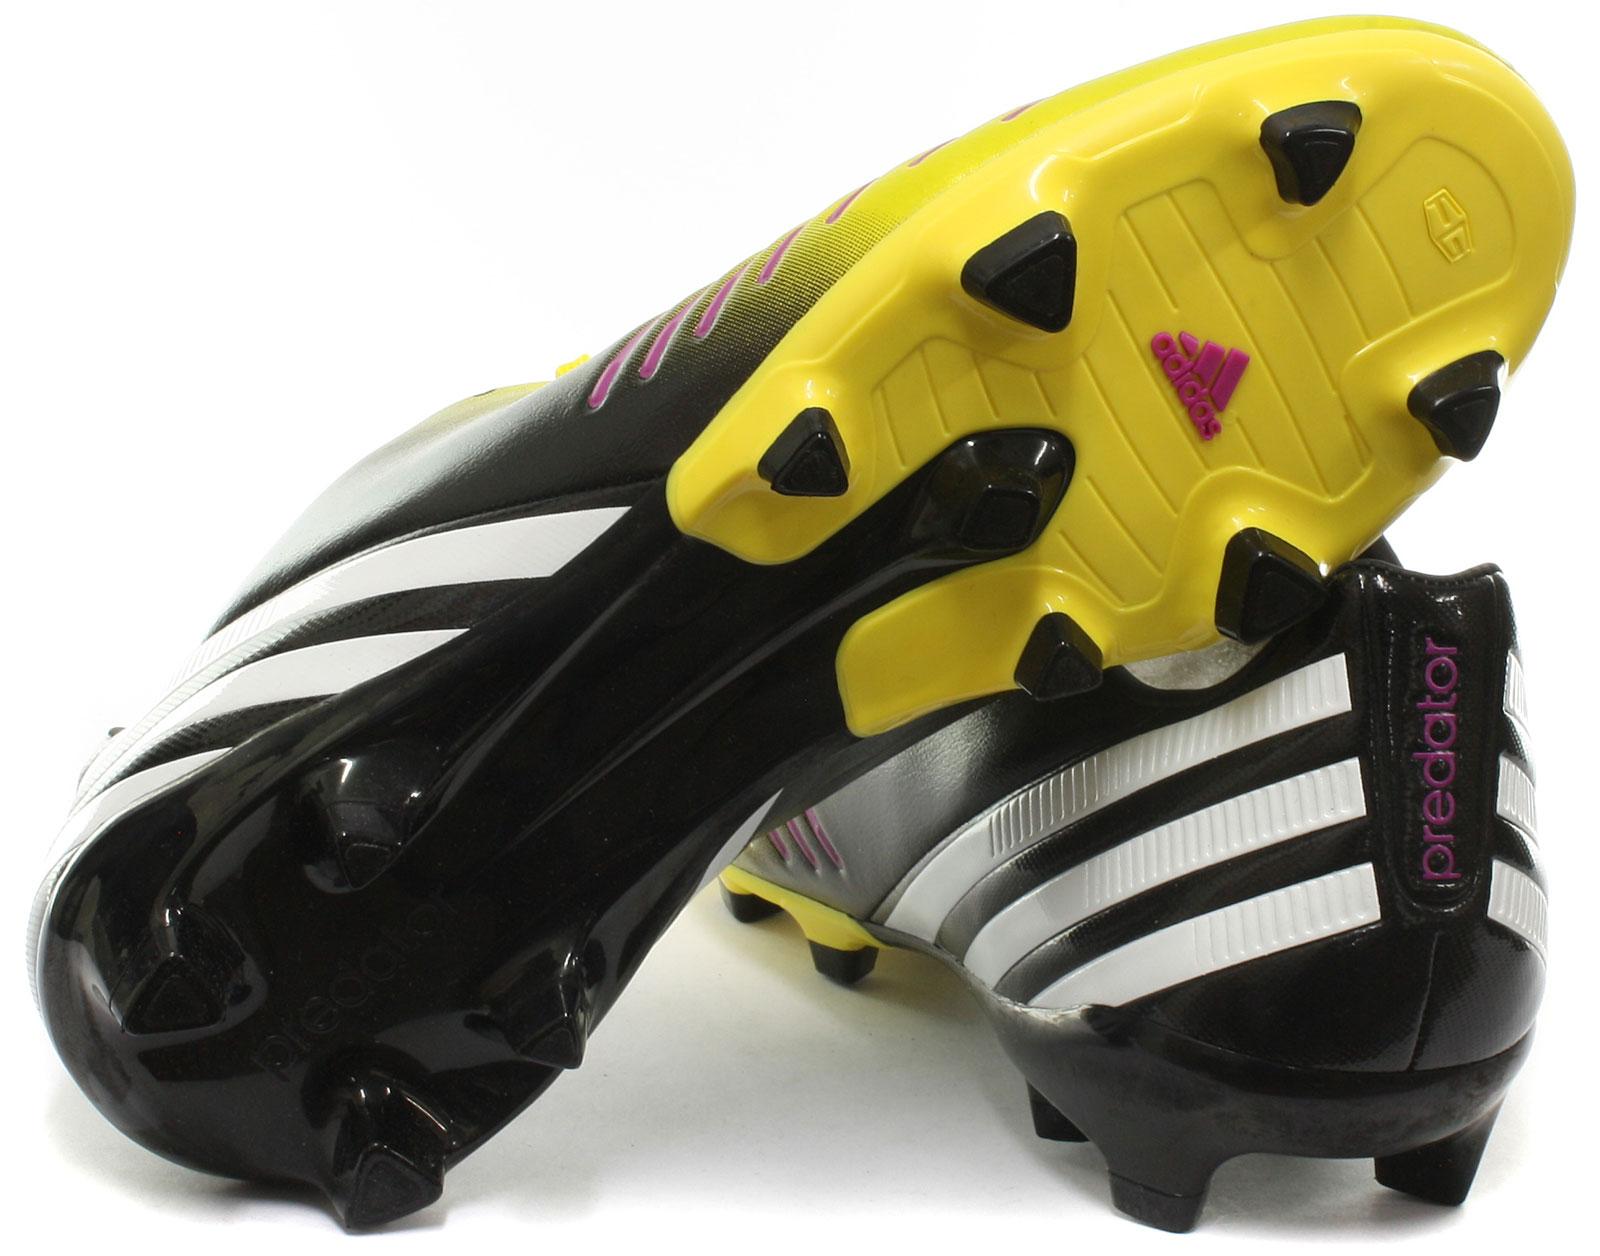 46c8a03aa adidas Predator Absolado LZ TRX FG Kids Junior Football Boots ALL SIZES   COLOURS